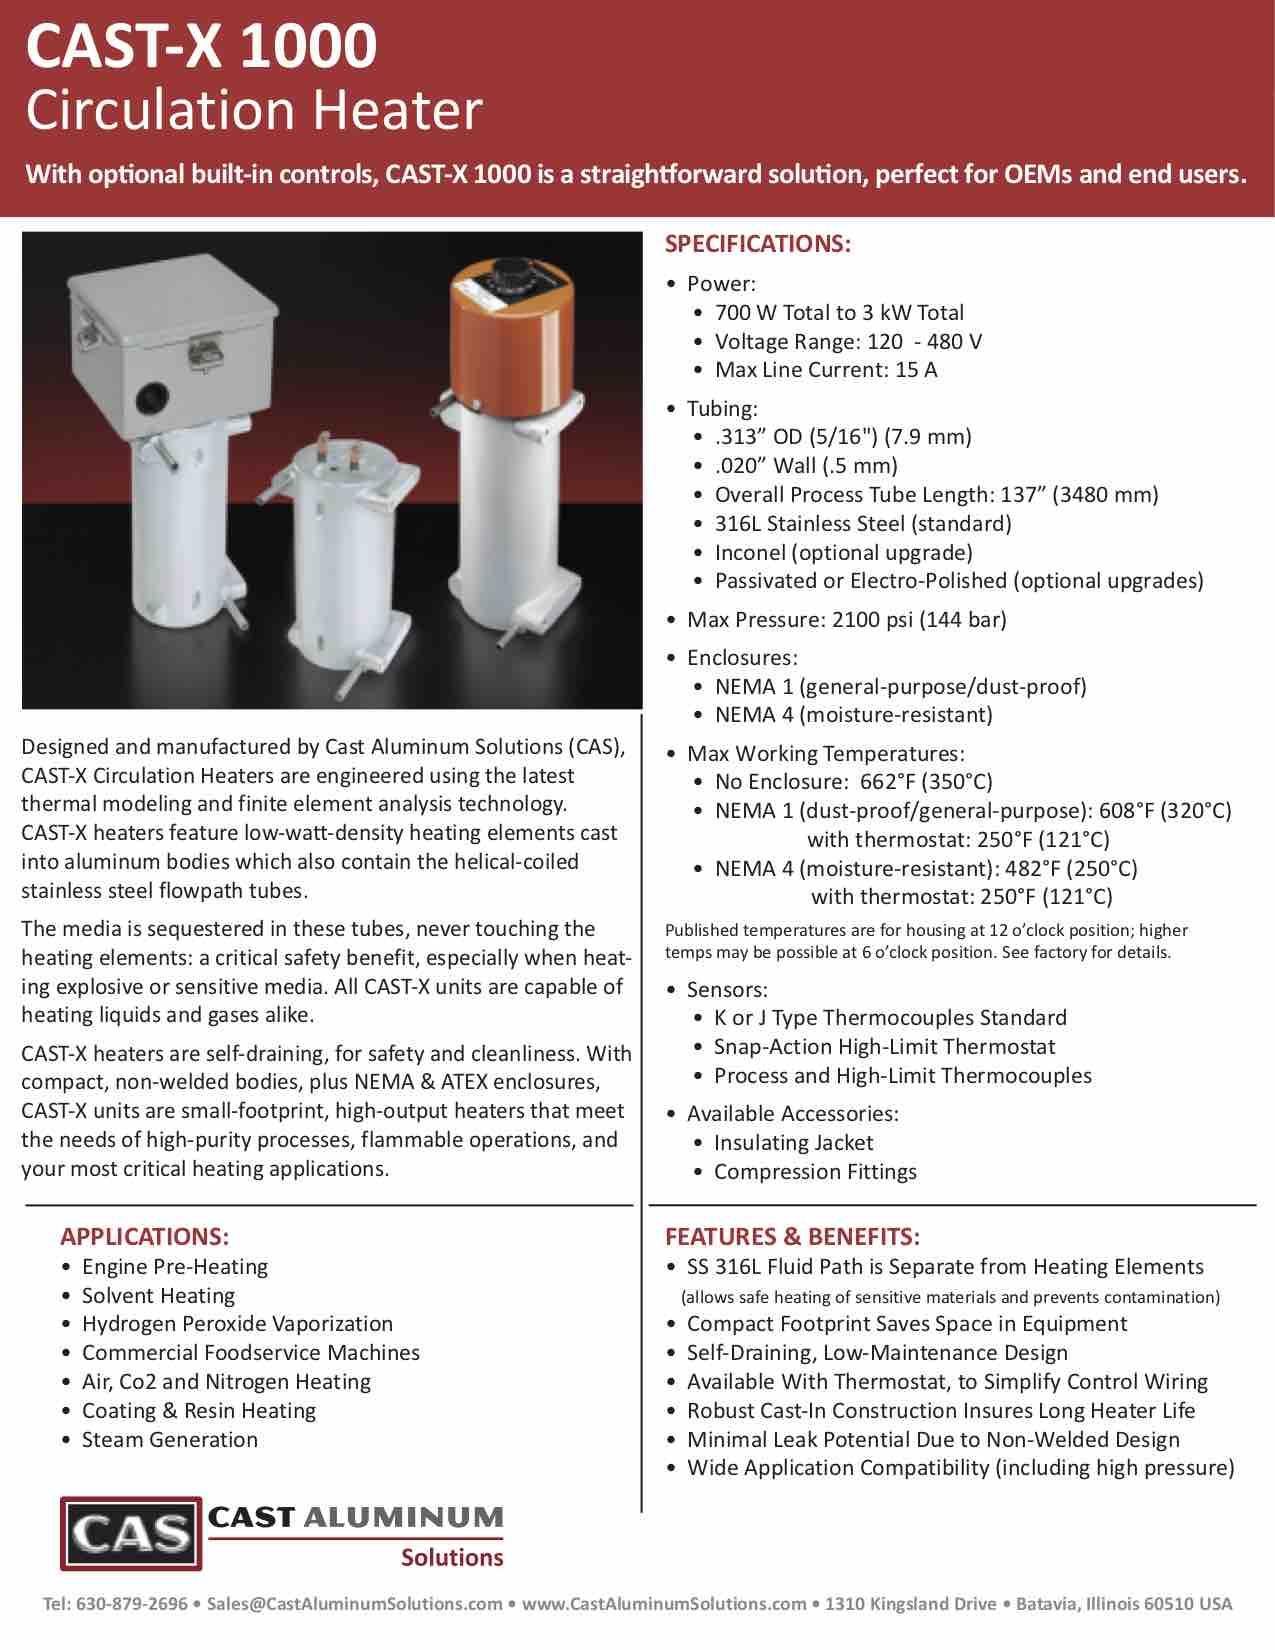 CAST X 1000 Circulation Heater Cast Aluminum Solutions (dragged)